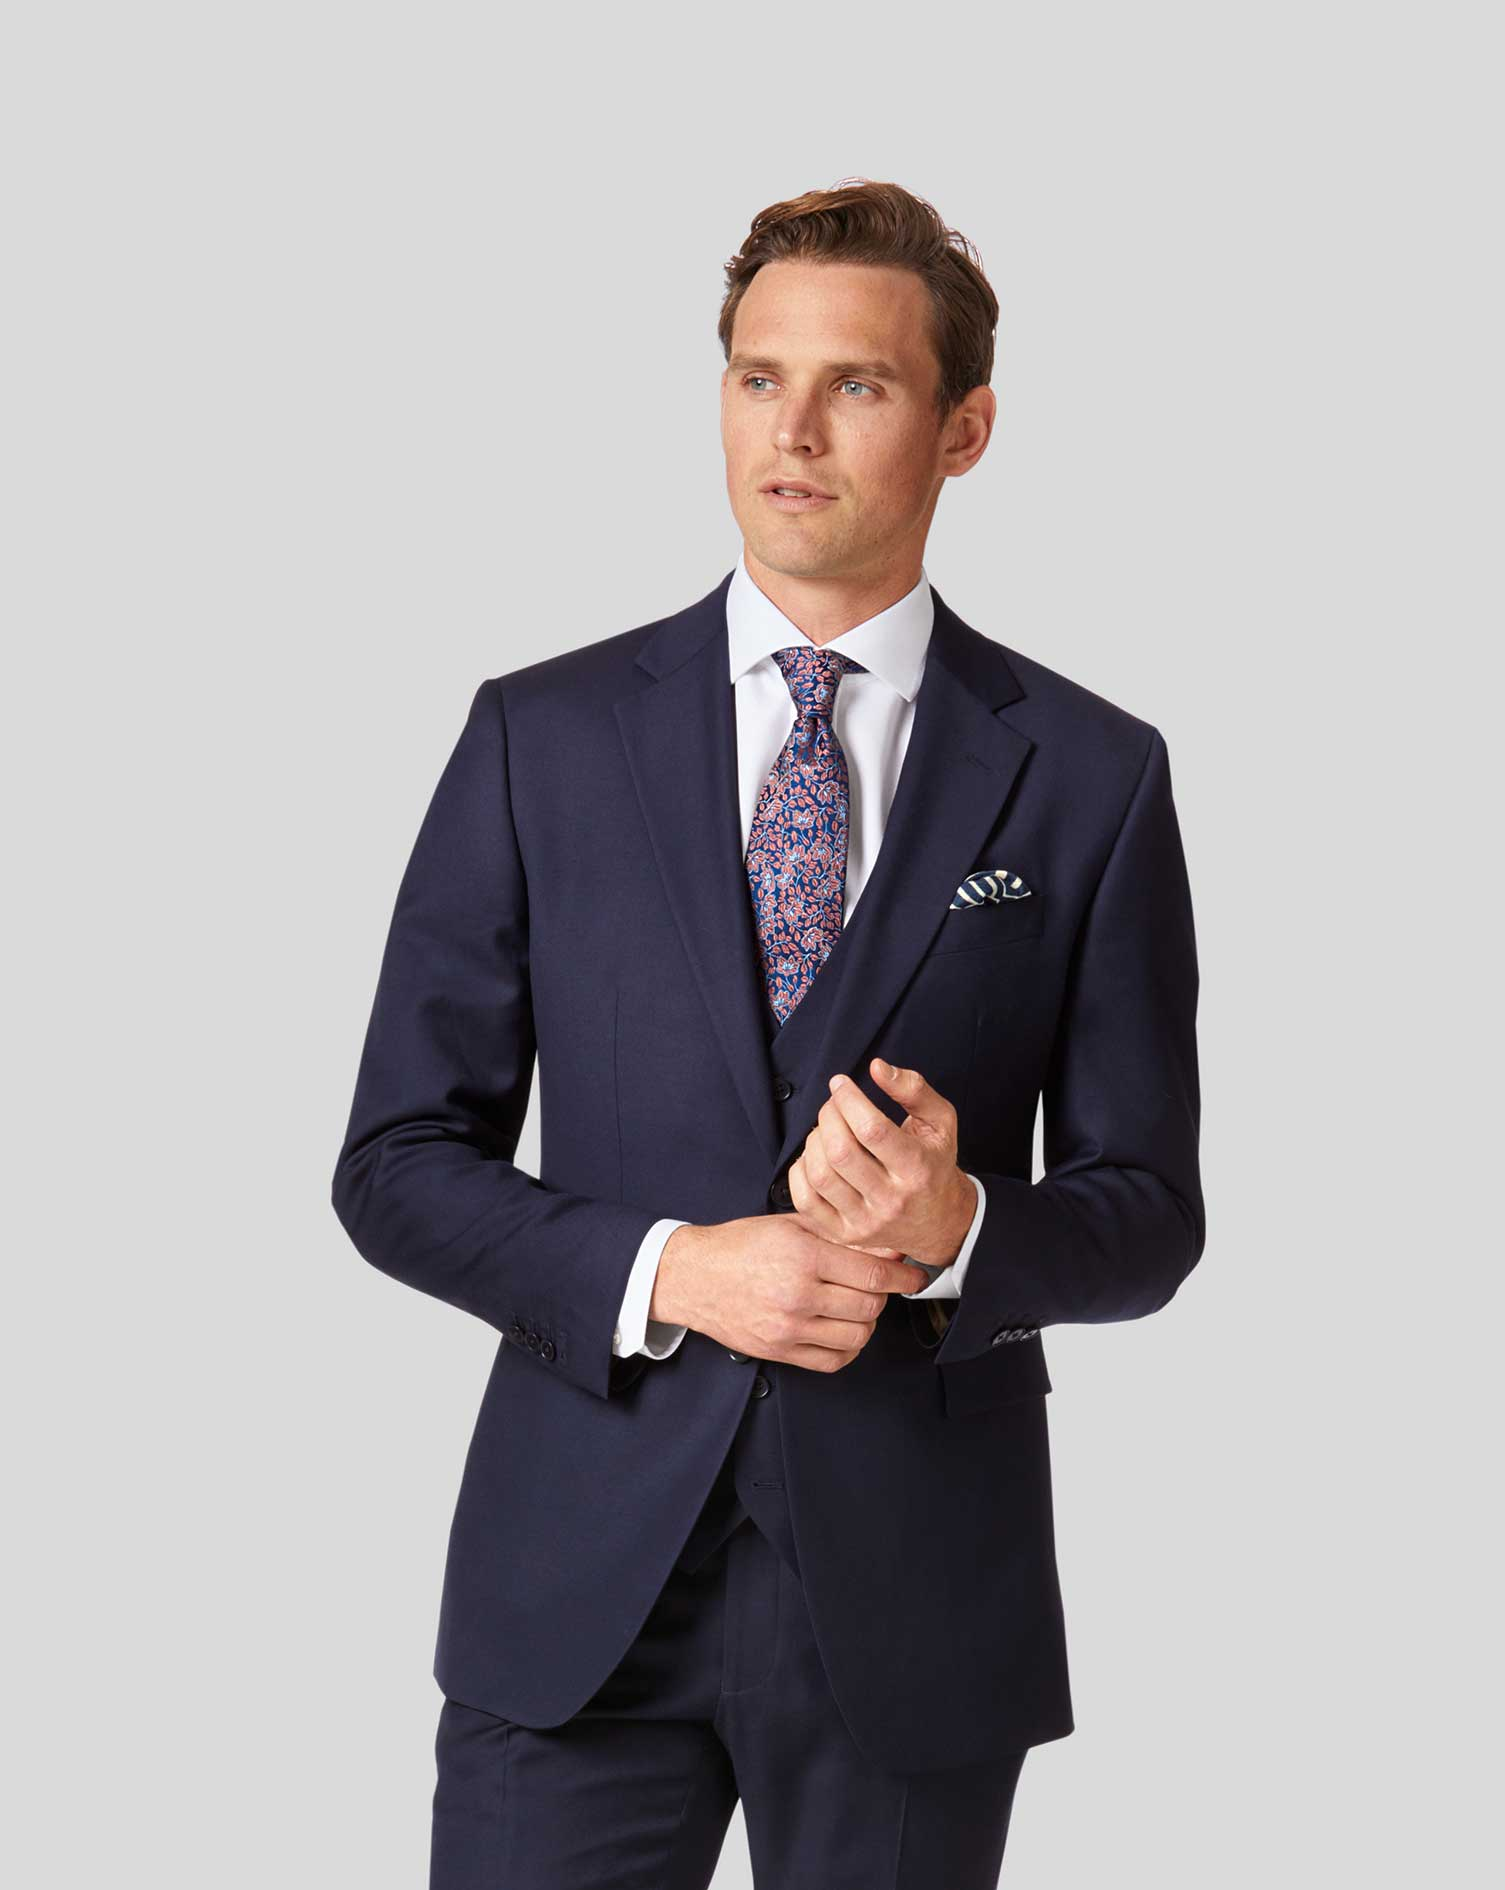 Twill Business Suit Jacket - Navy   Charles Tyrwhitt